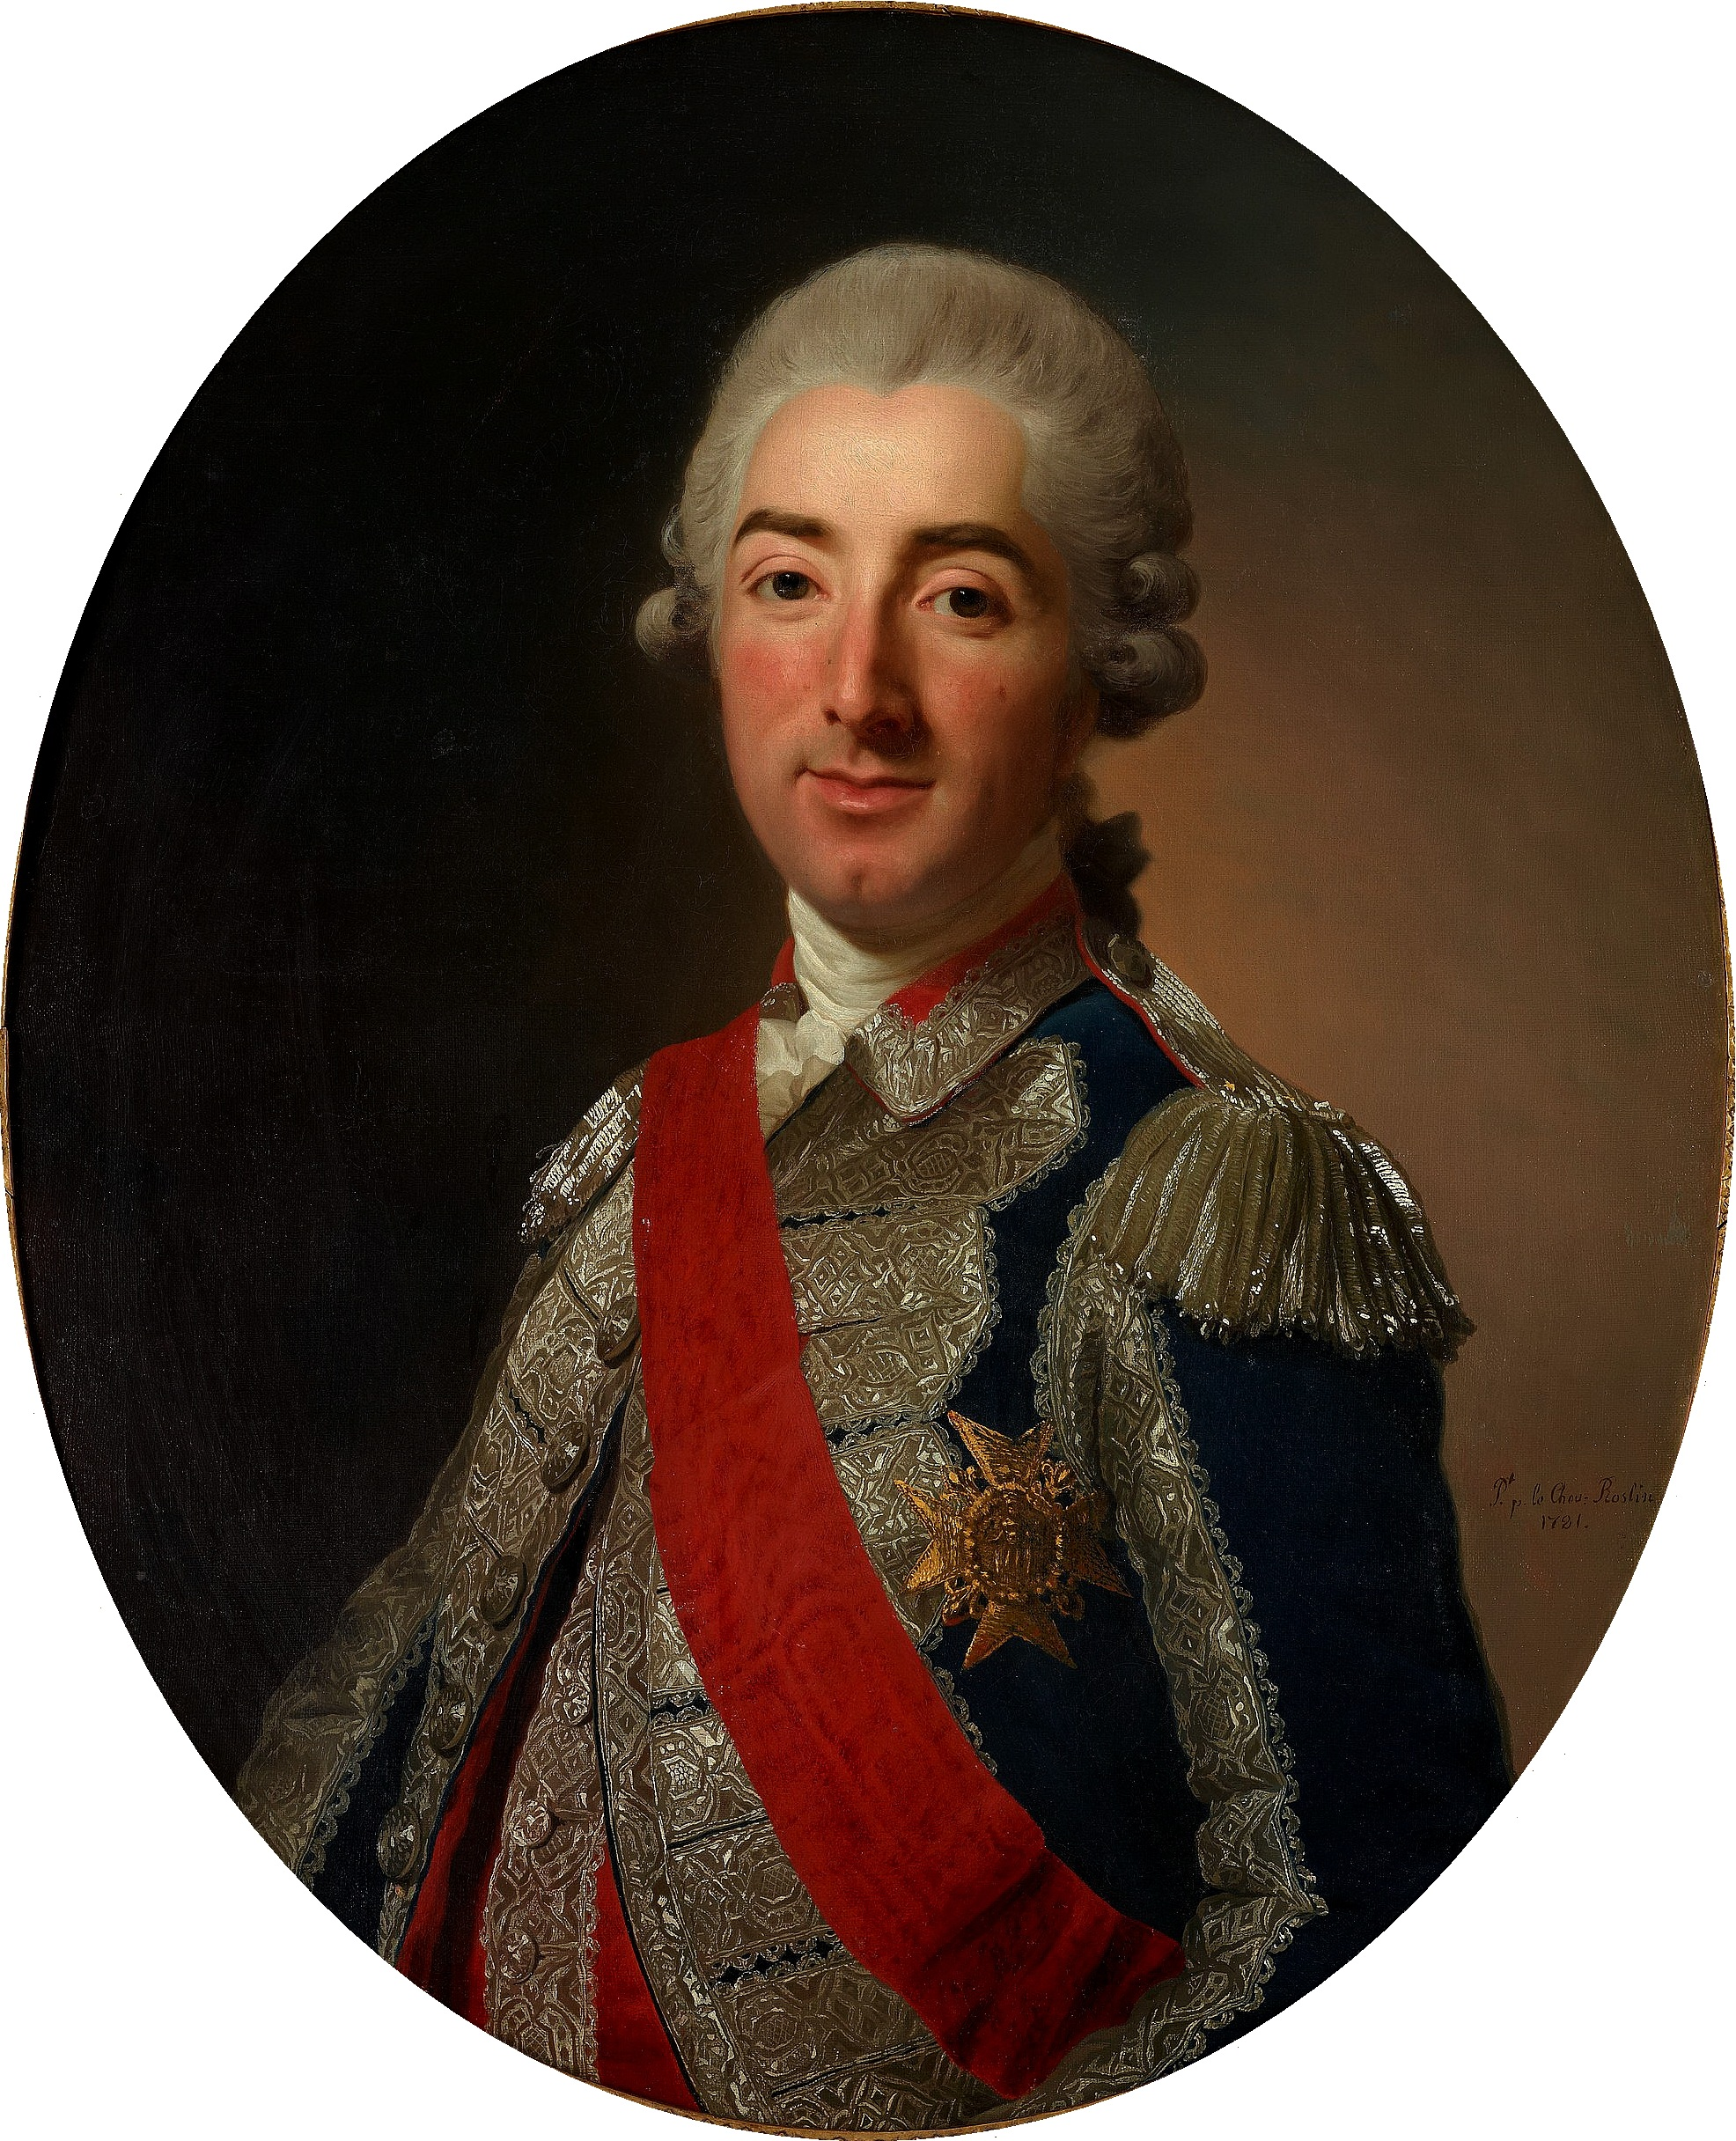 Alexander_Roslin._Cosme_De_Beaupoil,_markis_de_St_Aulaire_(1741-1822)